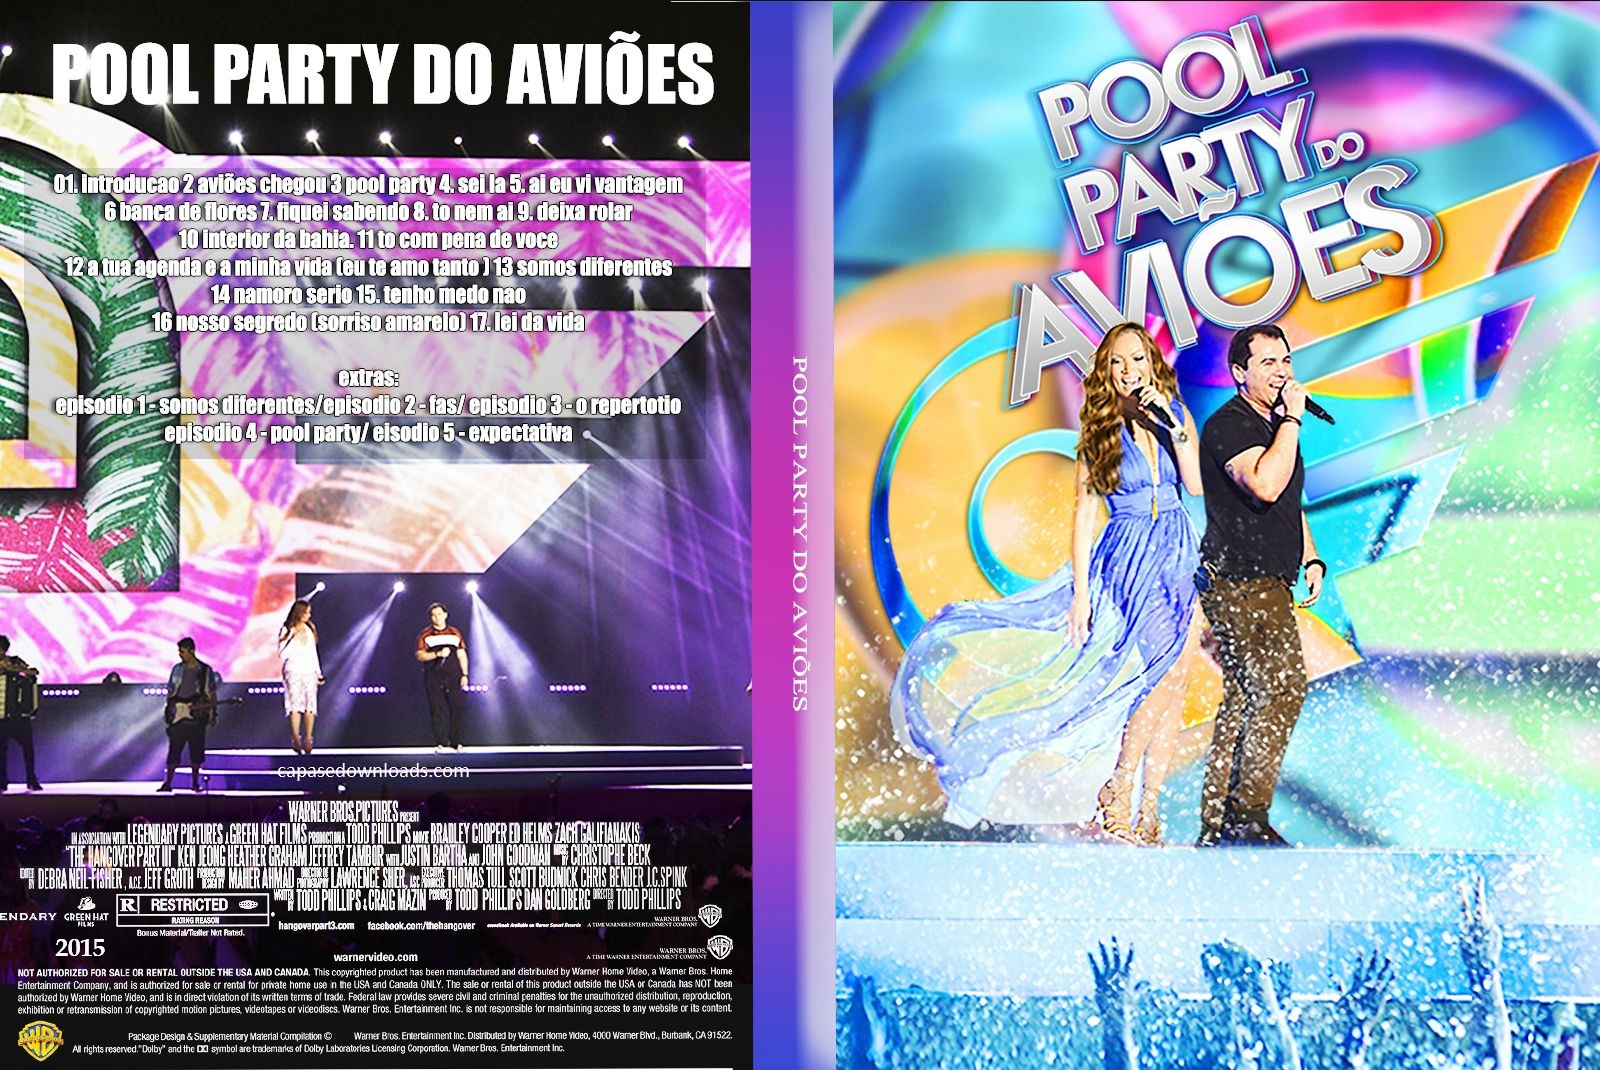 Download Aviões do Forró Pool Party do Aviões Ao Vivo DVDRip XviD 2015 avioees